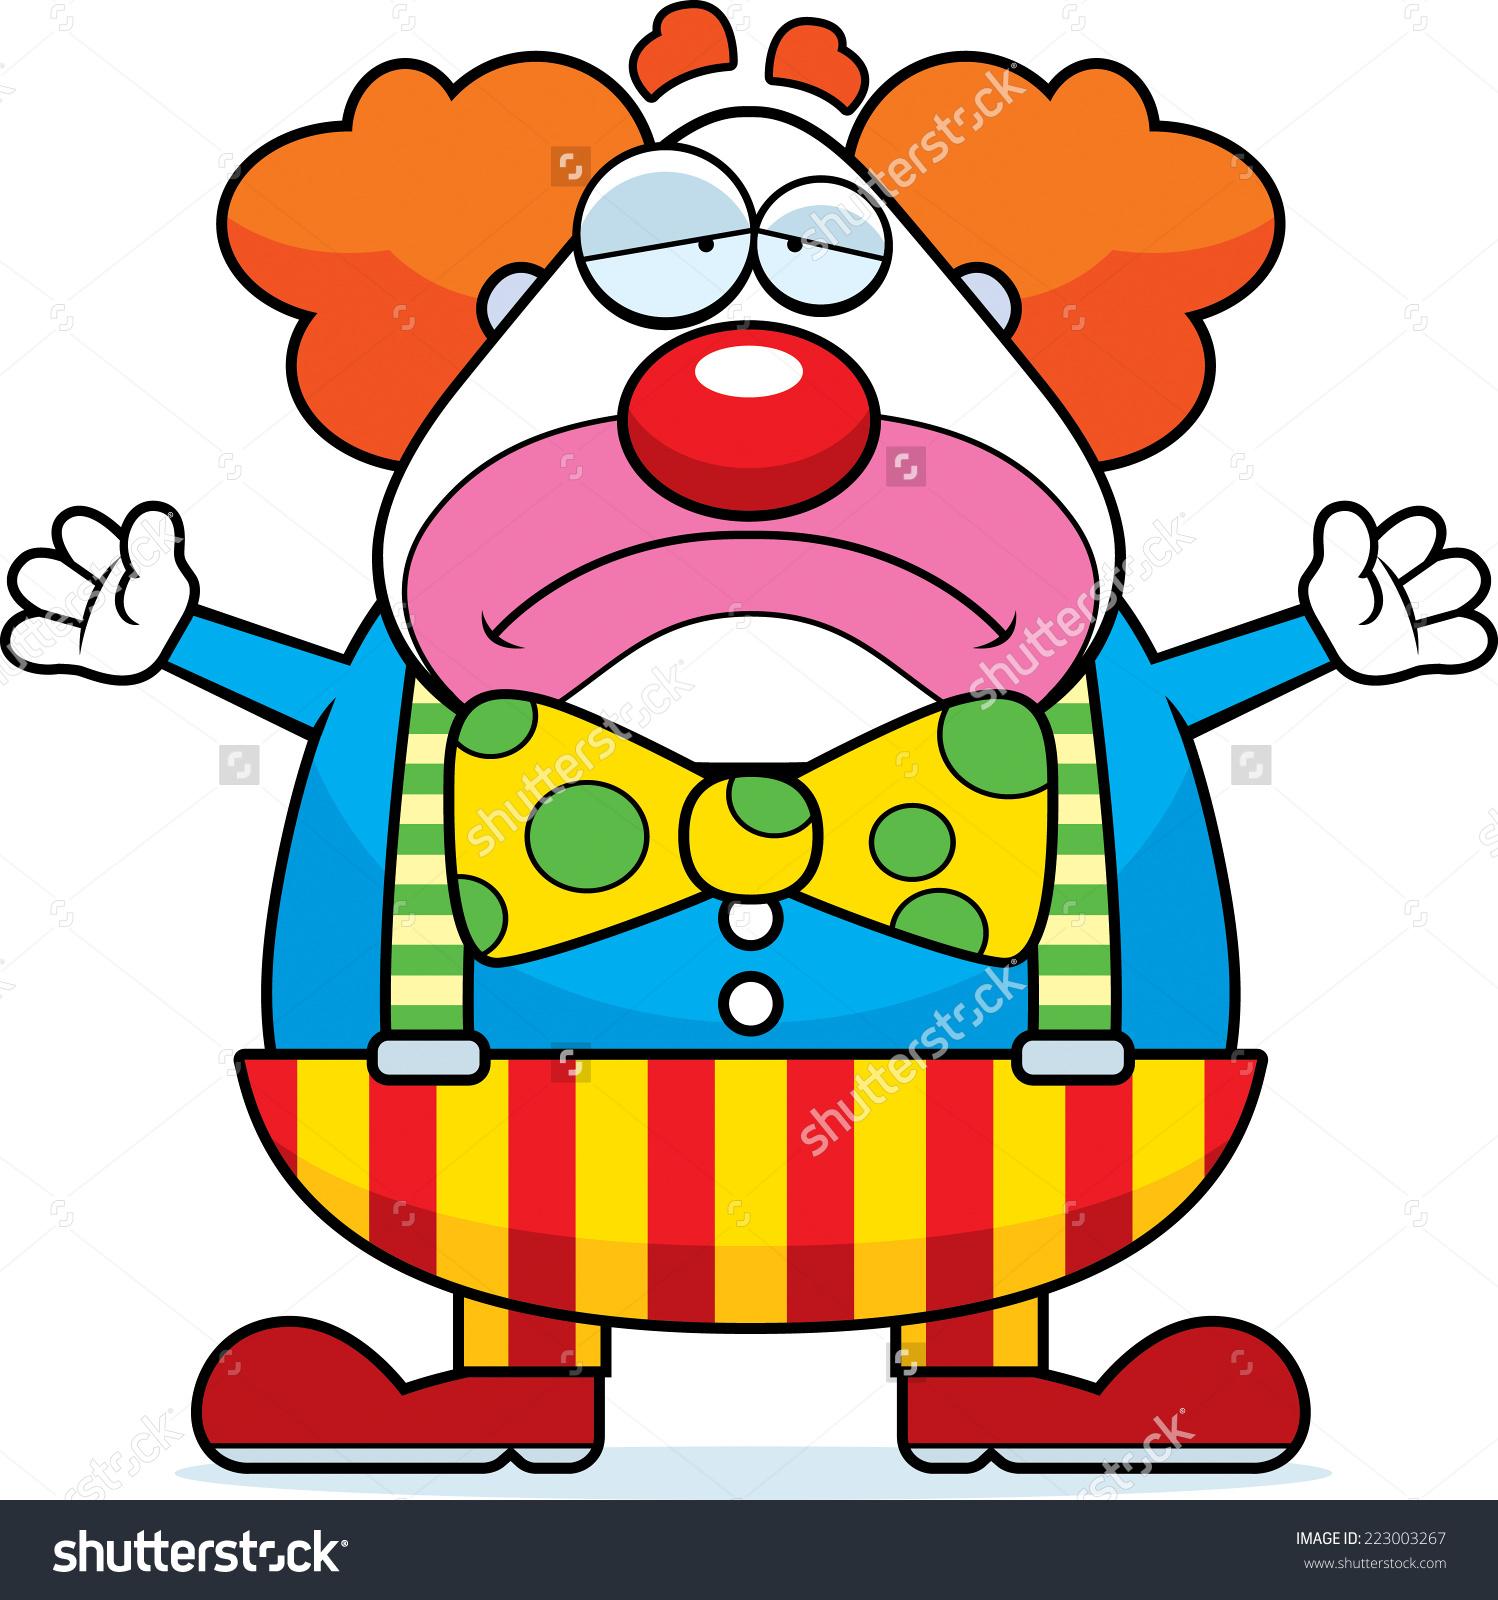 1498x1600 Crying Clown Clipart